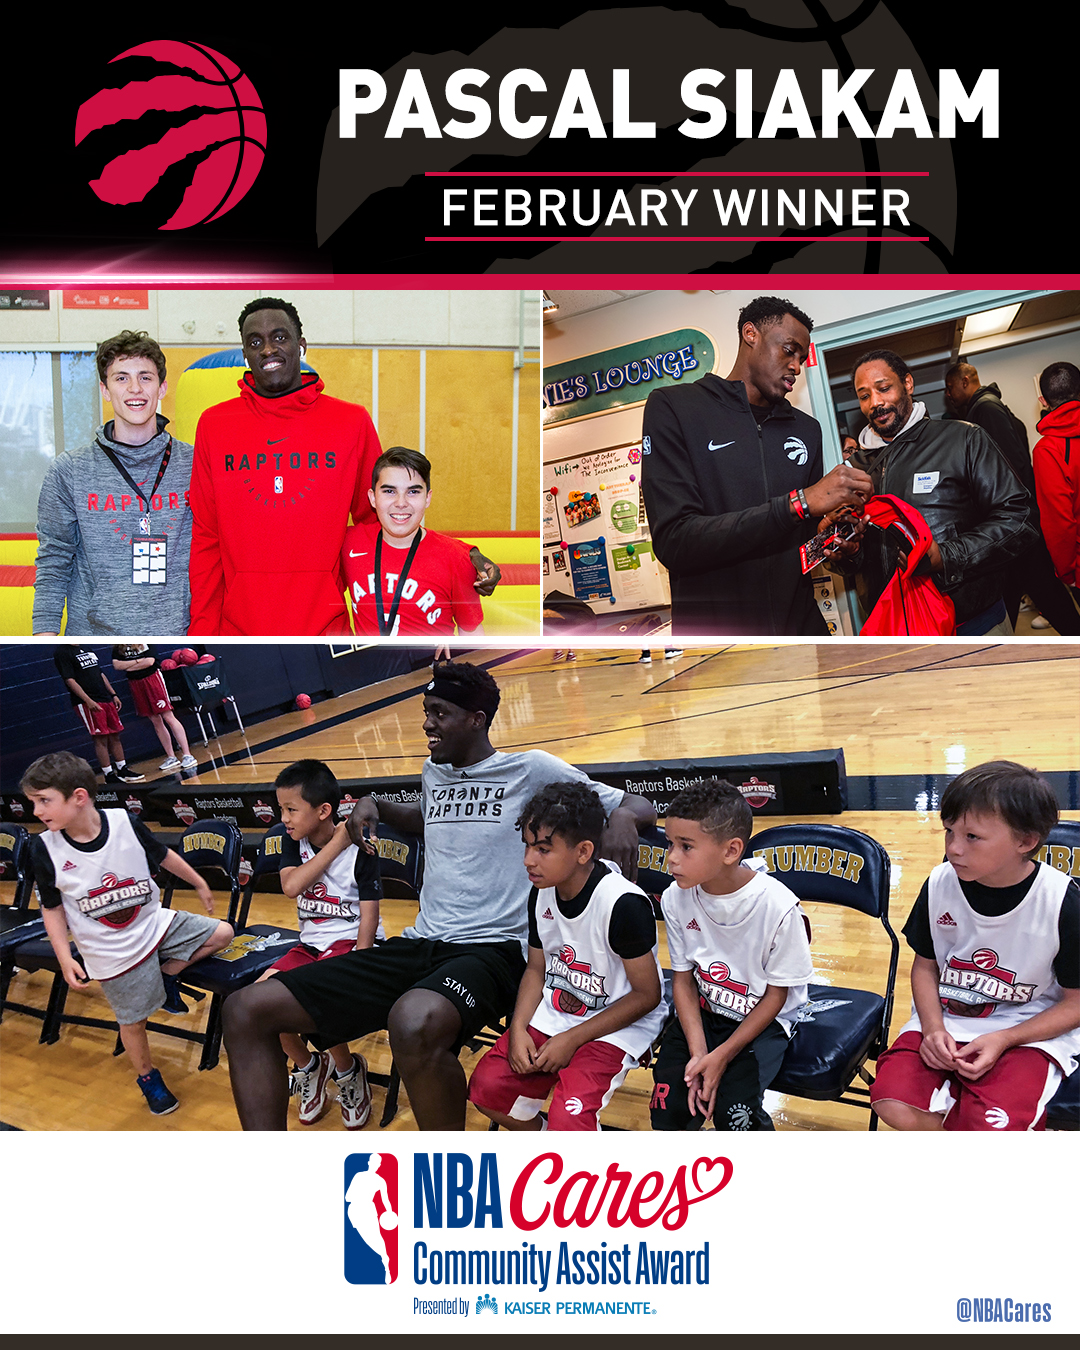 Toronto Raptors' Pascal Siakam Receives February NBA Cares Community Assist Award Presented By Kaiser Permanente